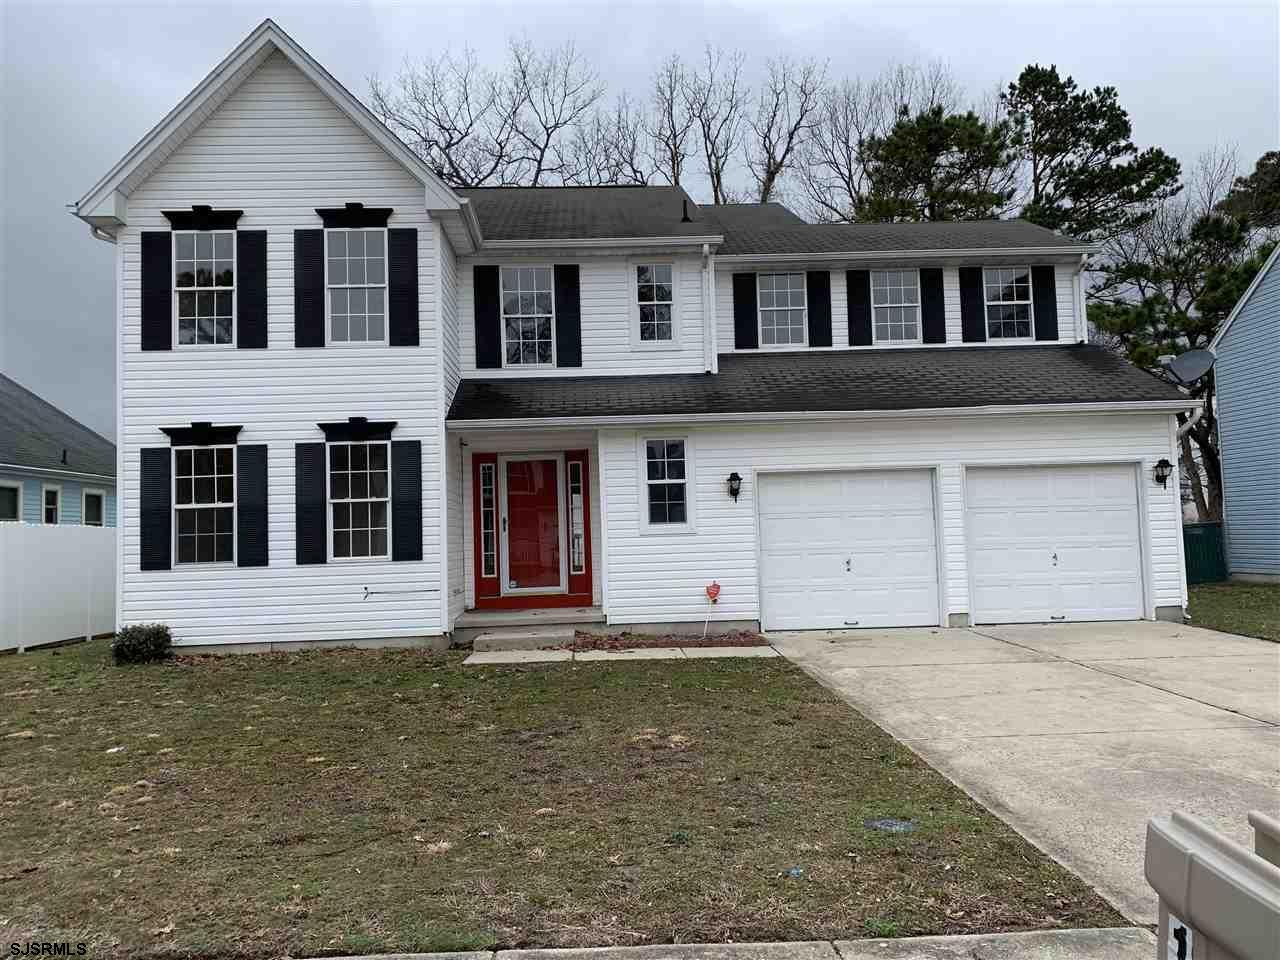 109 Theodore Ave, Egg Harbor Township, NJ, 08234